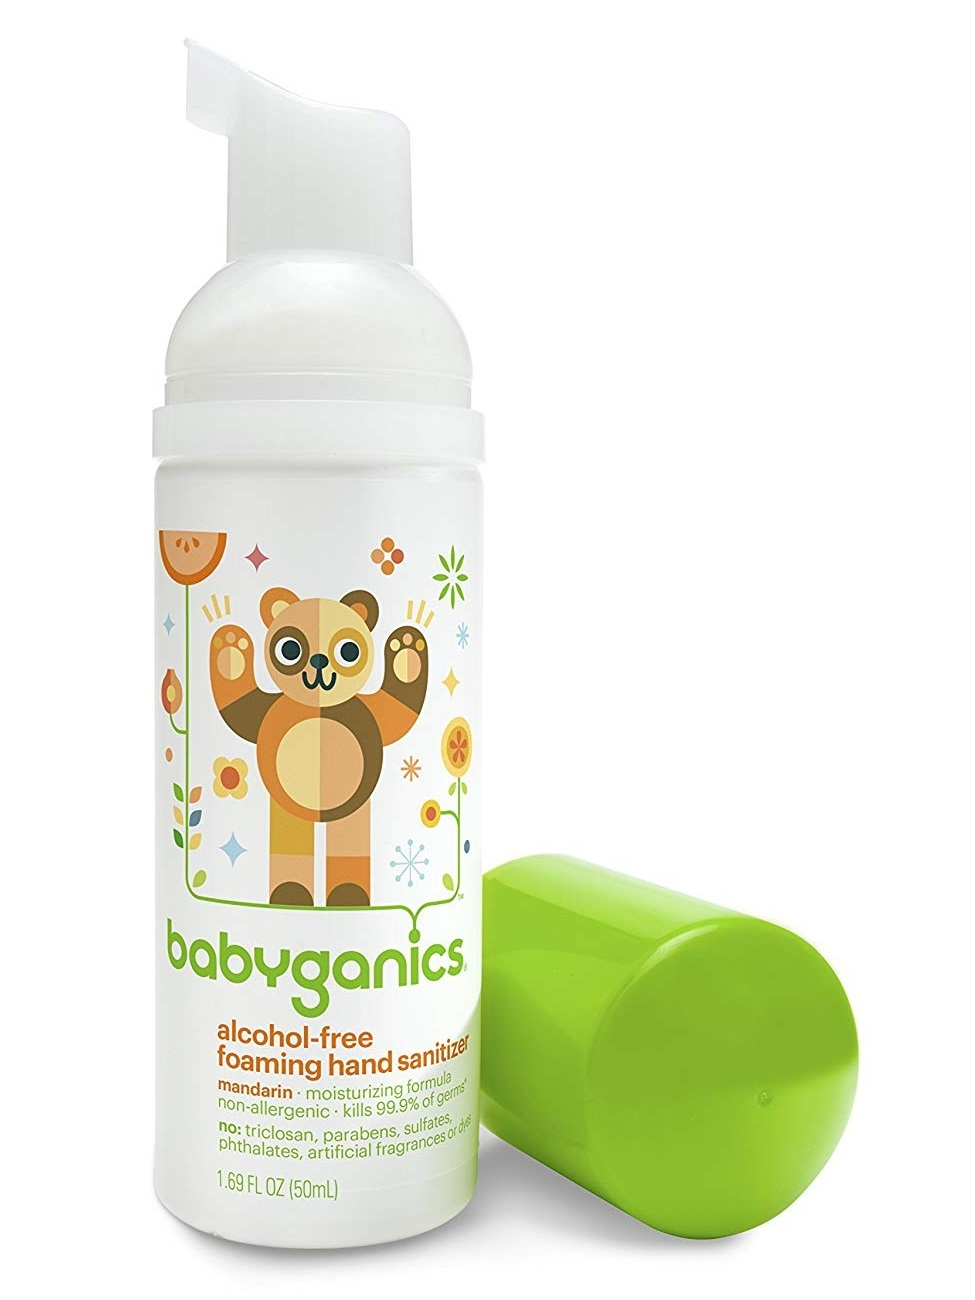 babyganics.jpg